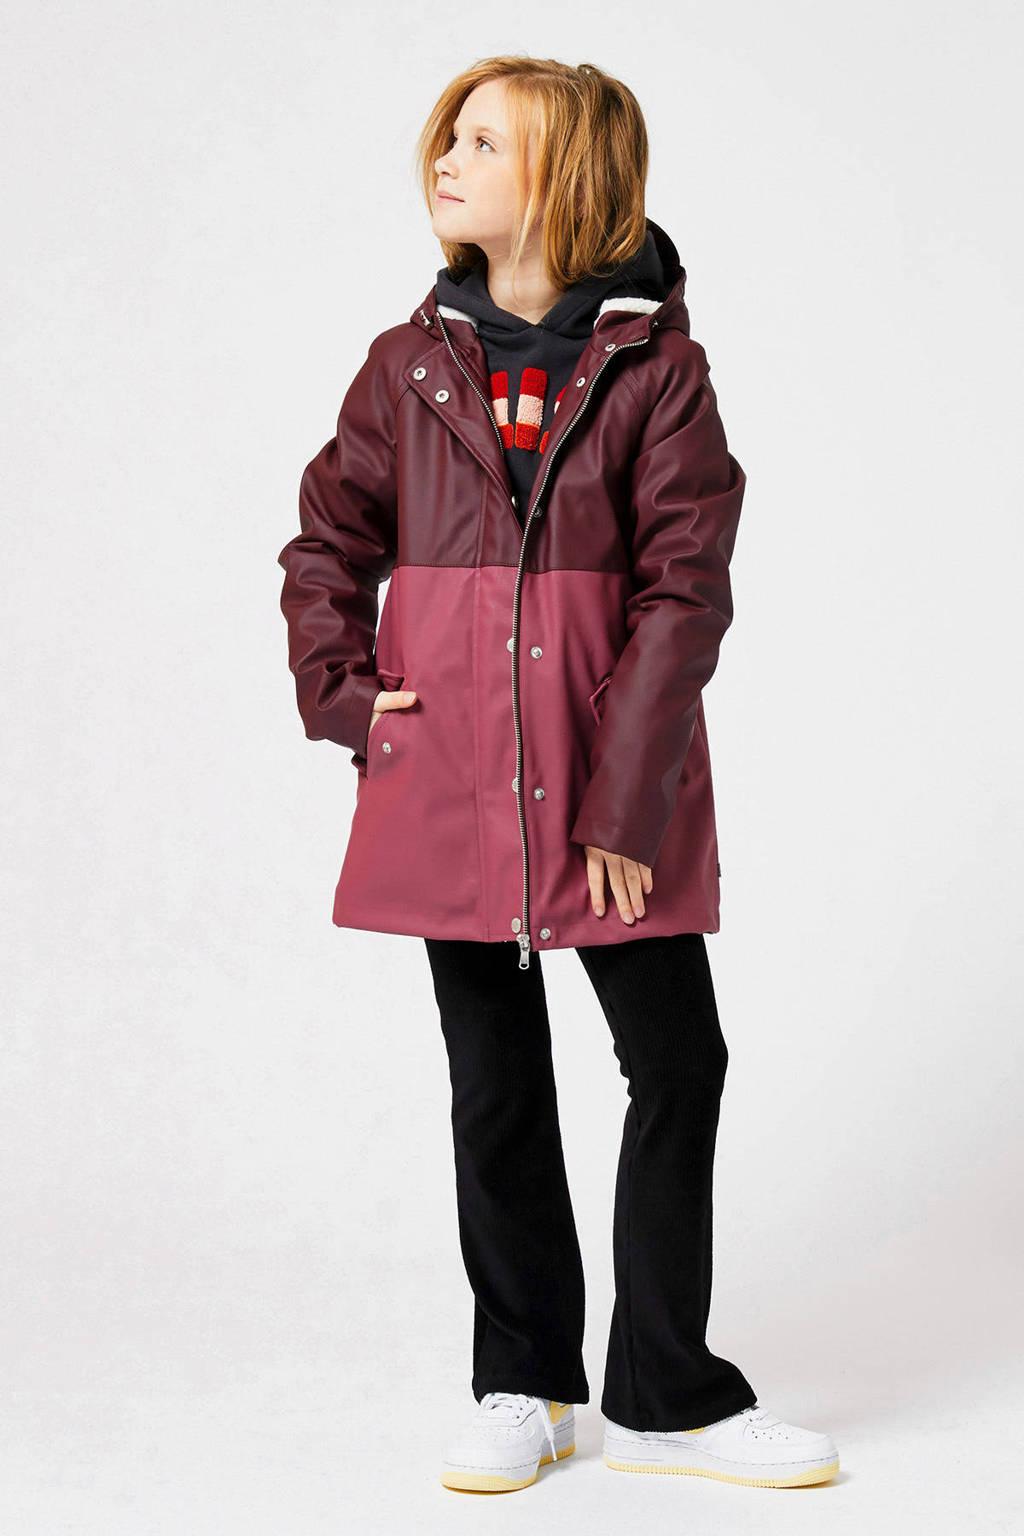 America Today Junior regenjas rood Janet, Donkerrood/roze